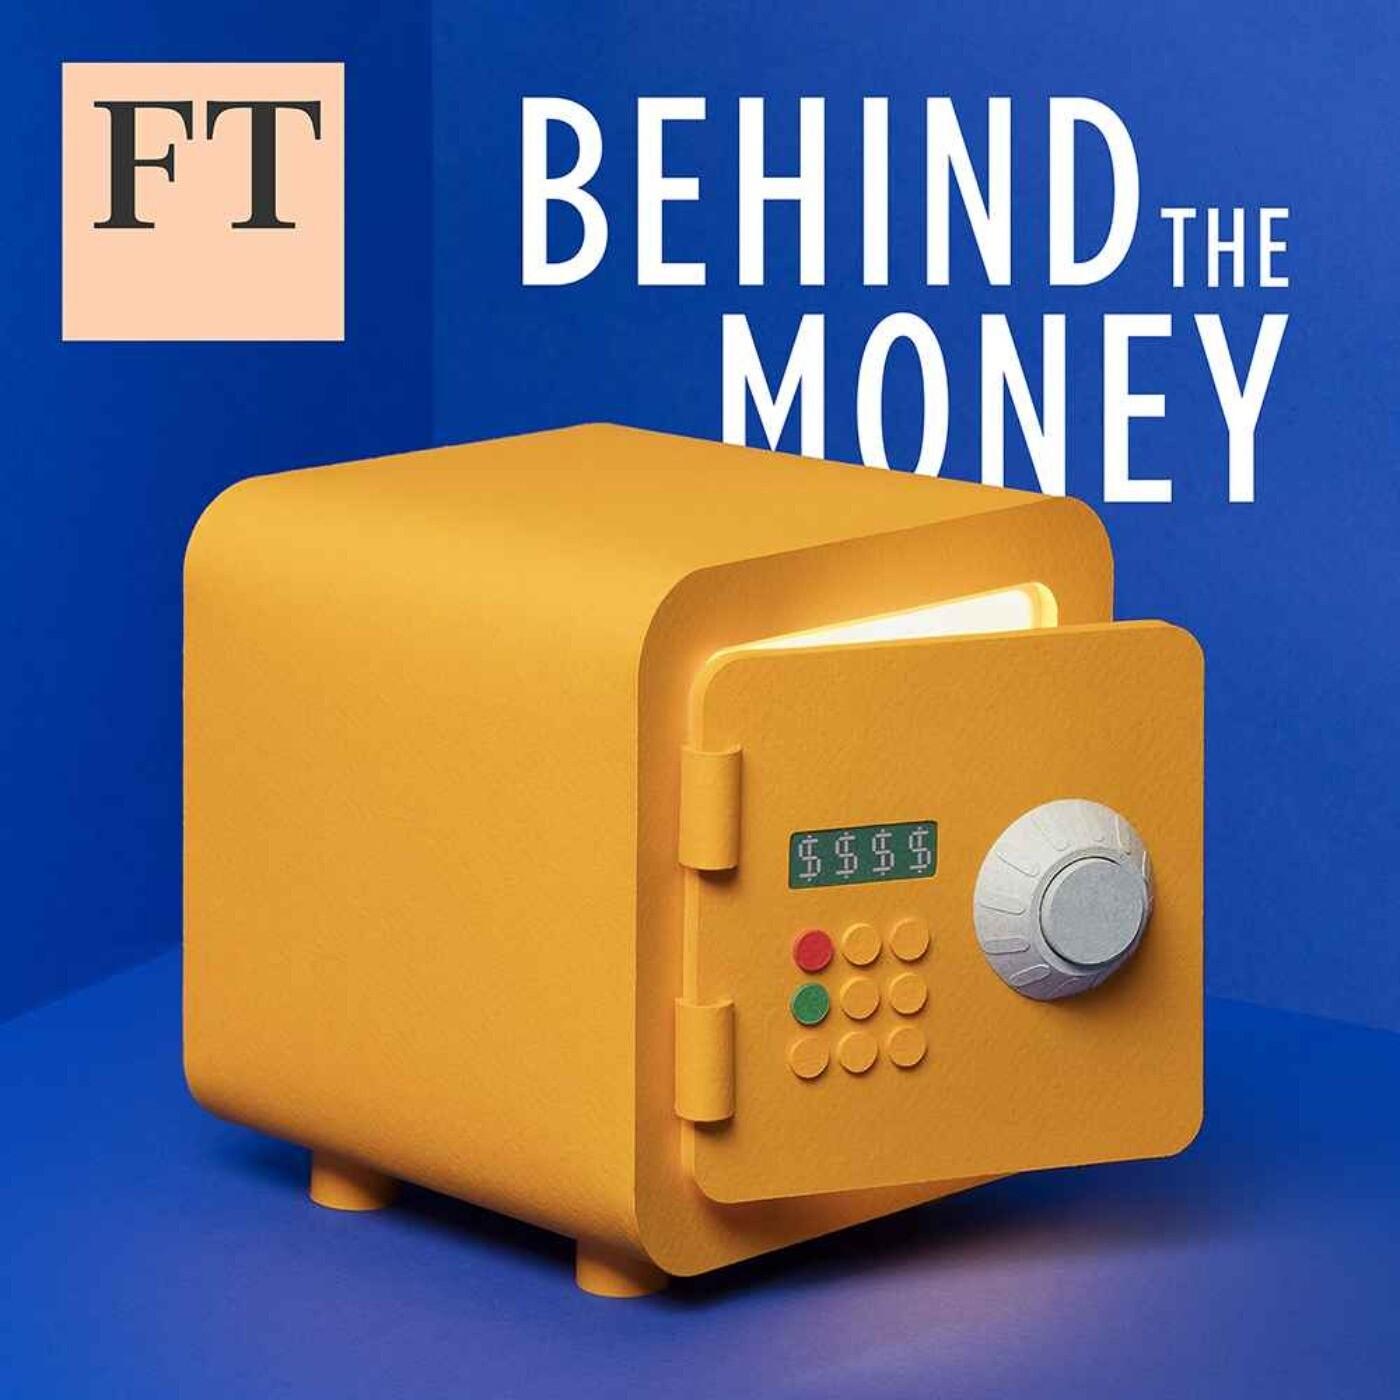 Bank profits in a recession